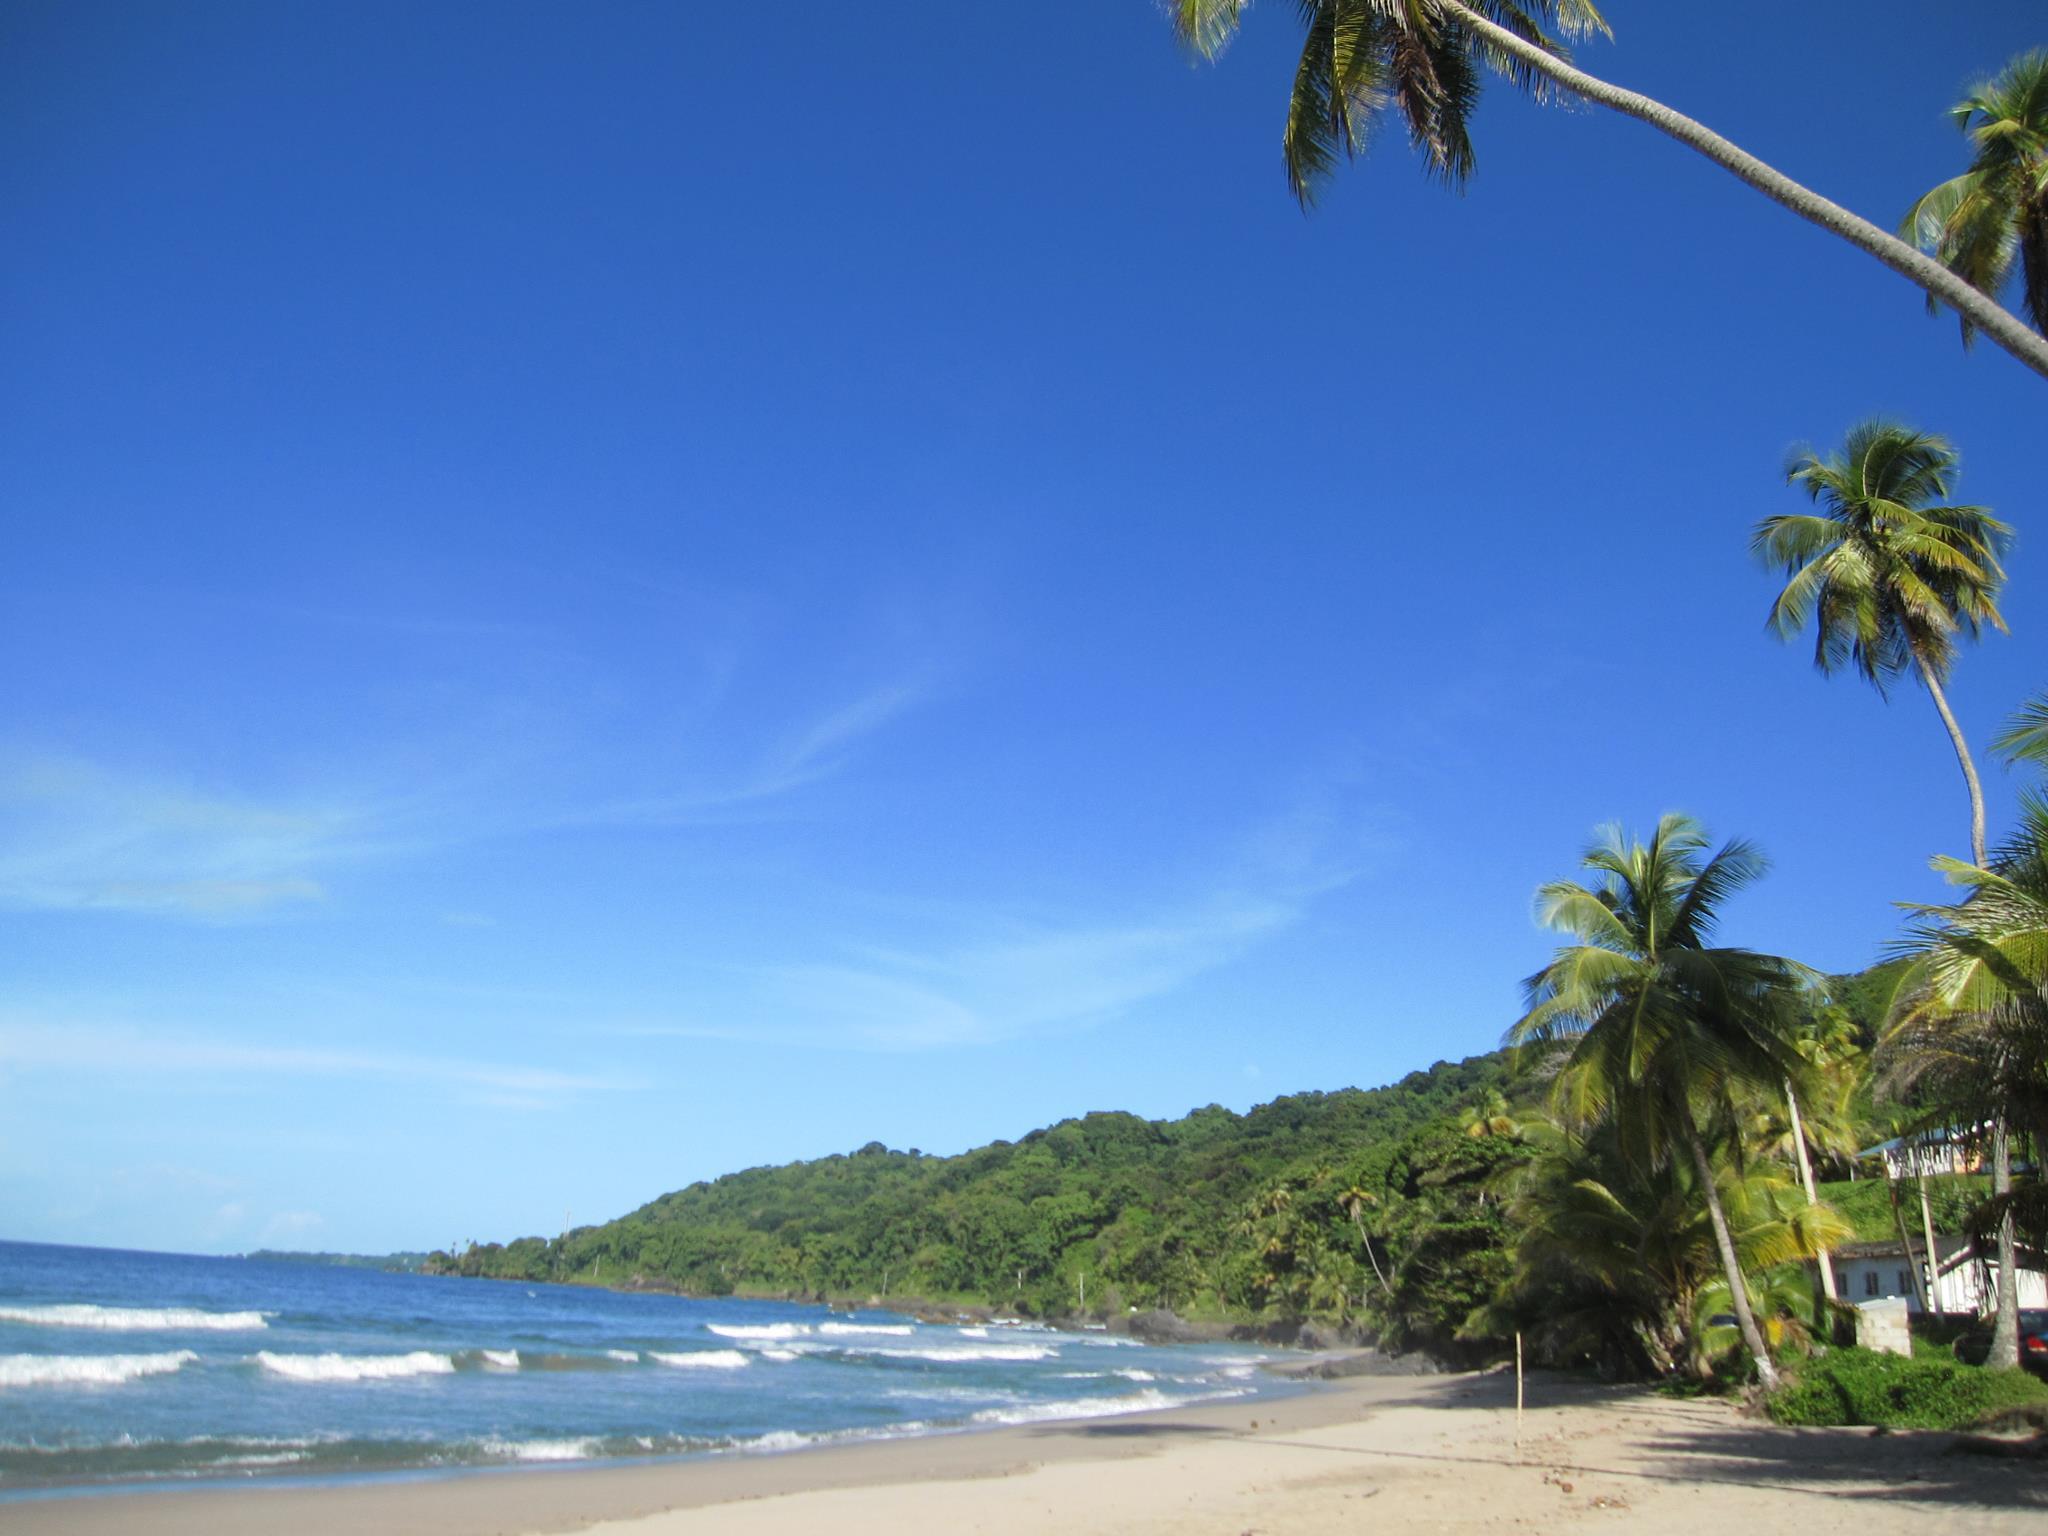 Island Appear Near Trinidad In The  S